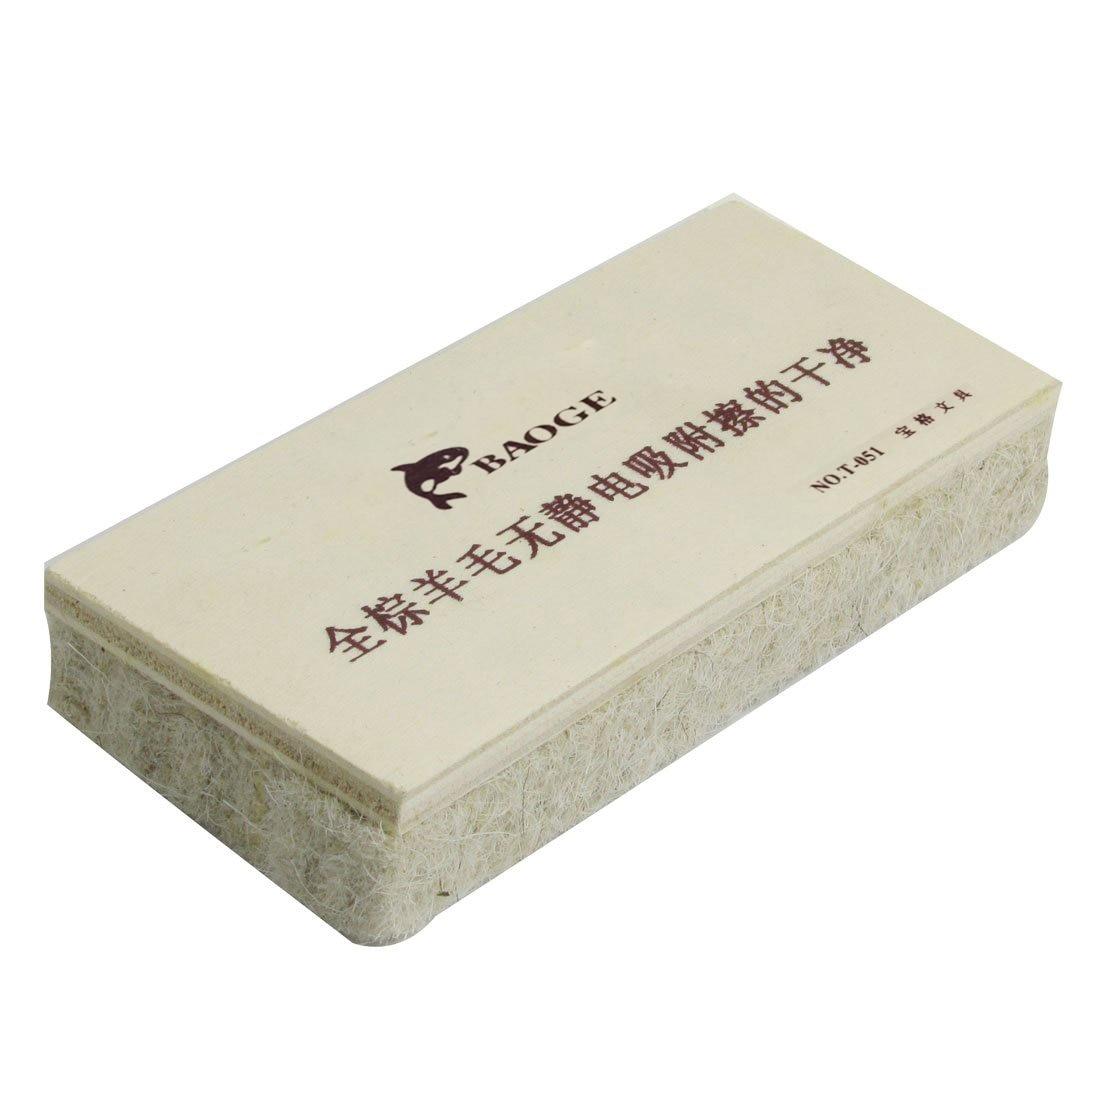 2 PCS Of Wood Shell Rectangle Shape Blackboard Eraser Cleaner